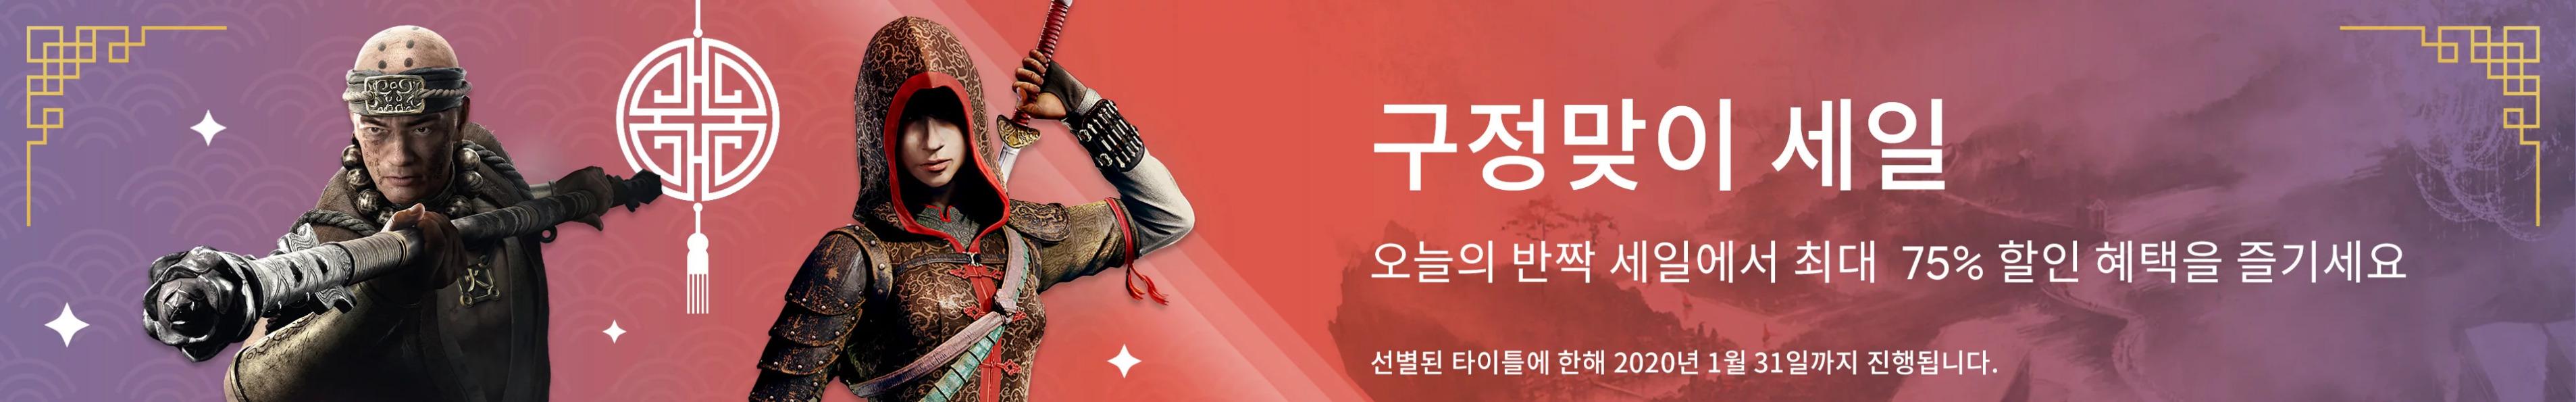 Screenshot_2020-01-21 구정 세일.jpg